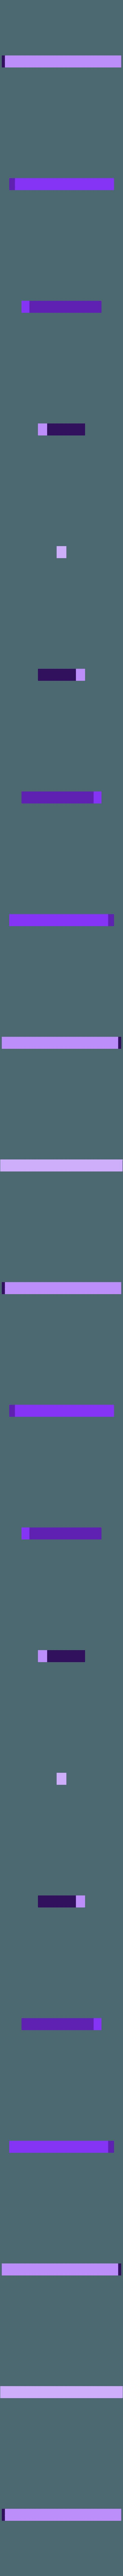 pcb_holder_2.STL Download free STL file PCB HOLDER Evo • 3D printer model, TheTNR